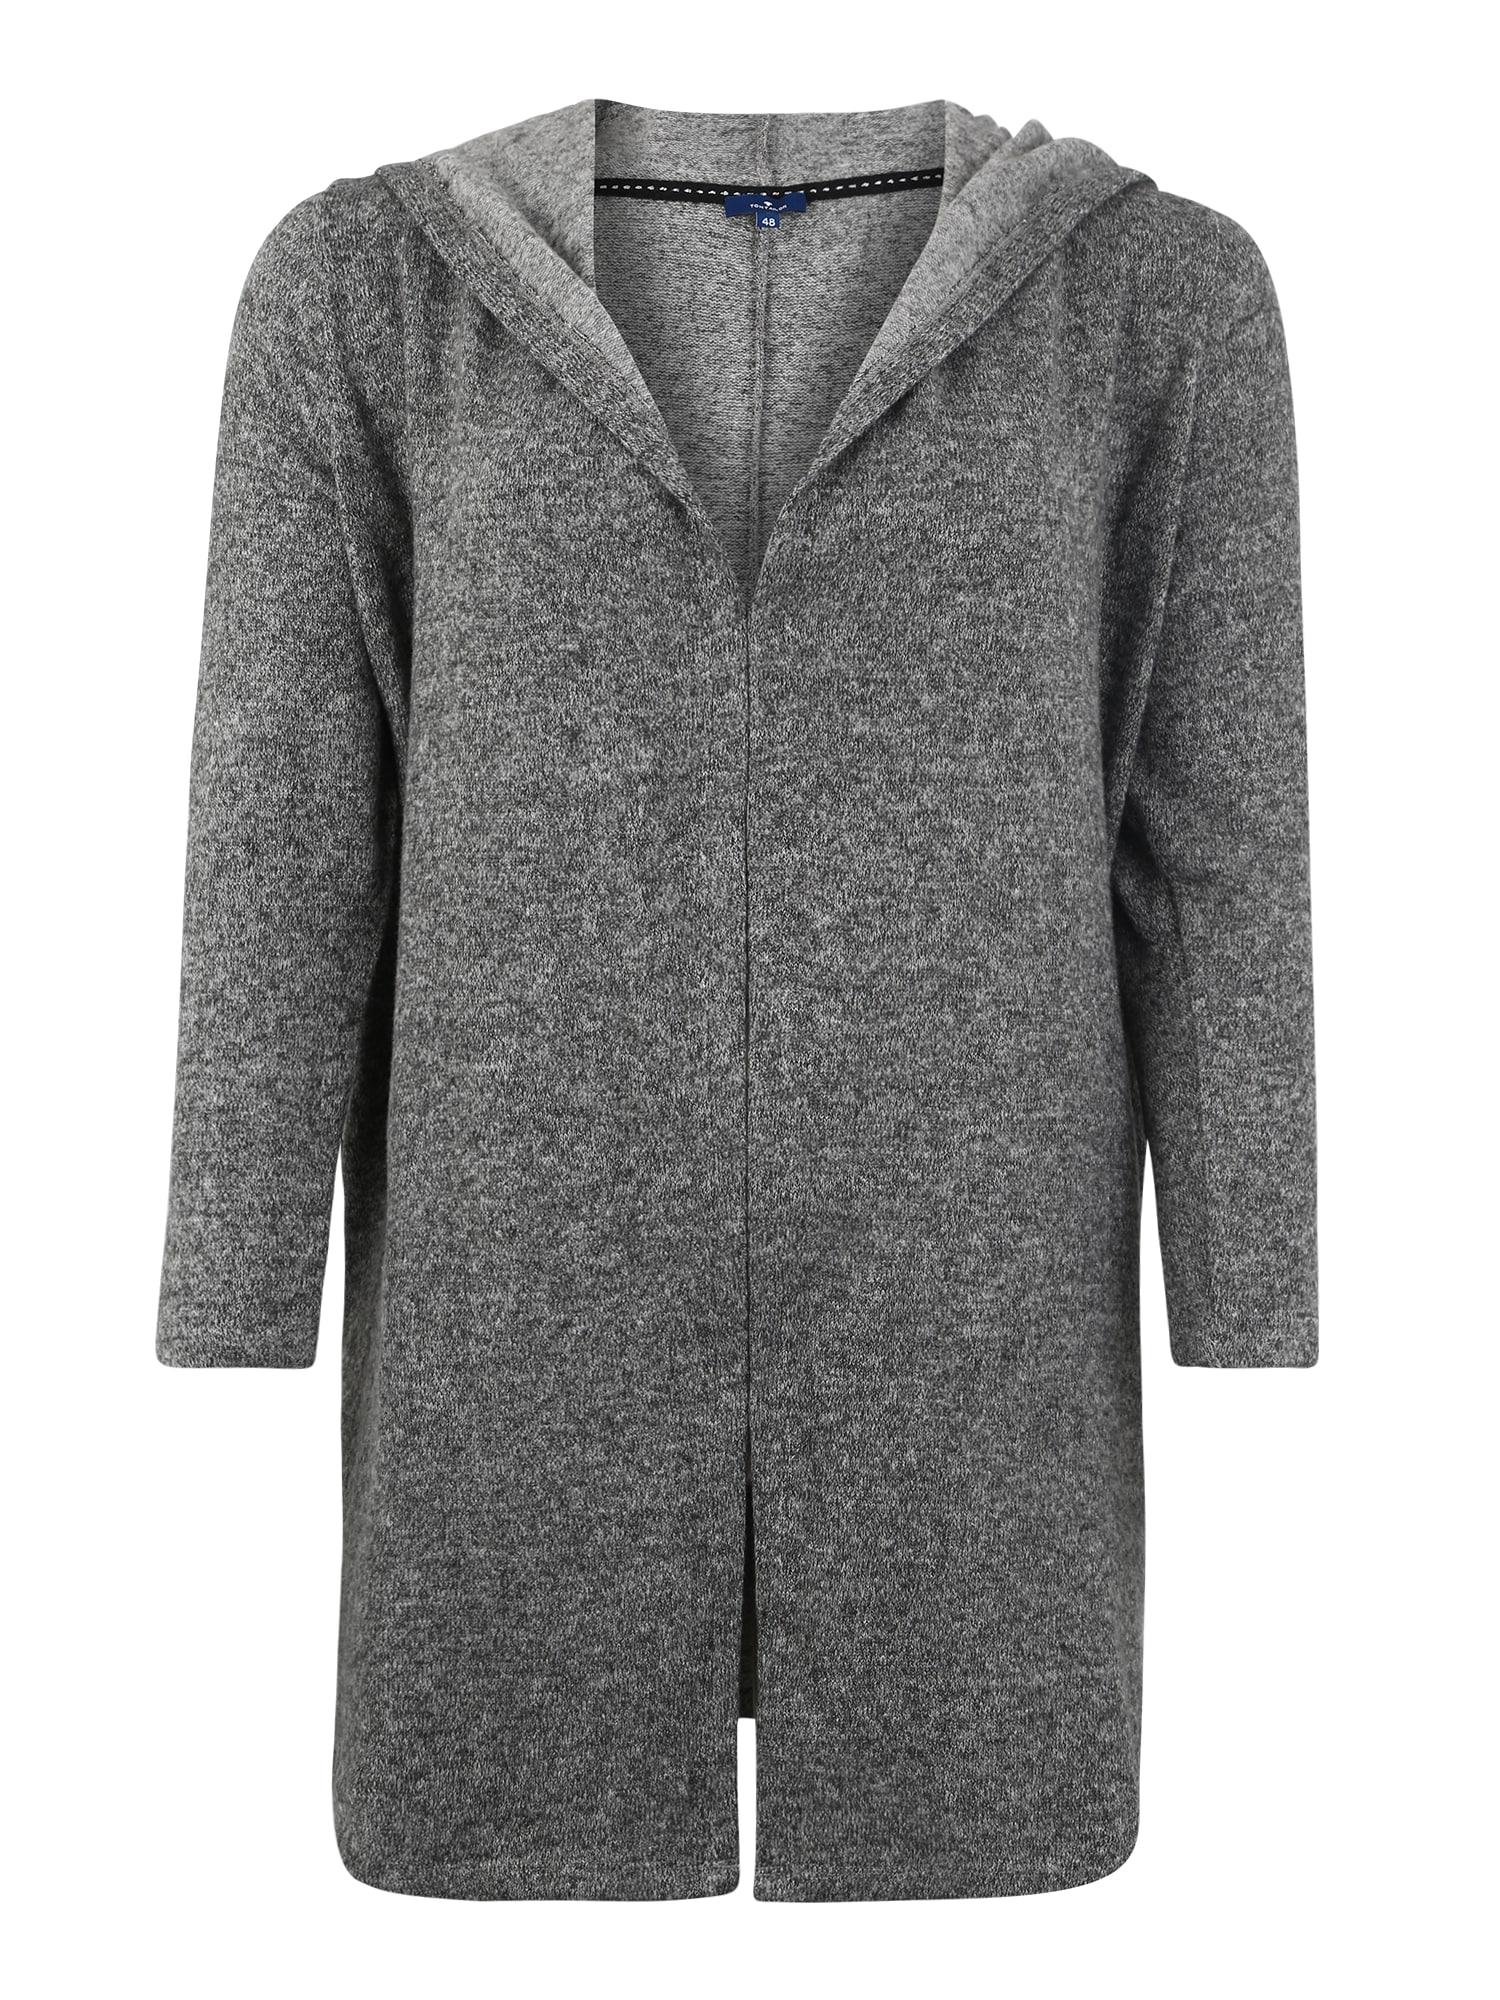 Tom Tailor Women Kardigan sweatjacket cosy fabric šedý melír Tom Tailor Women +